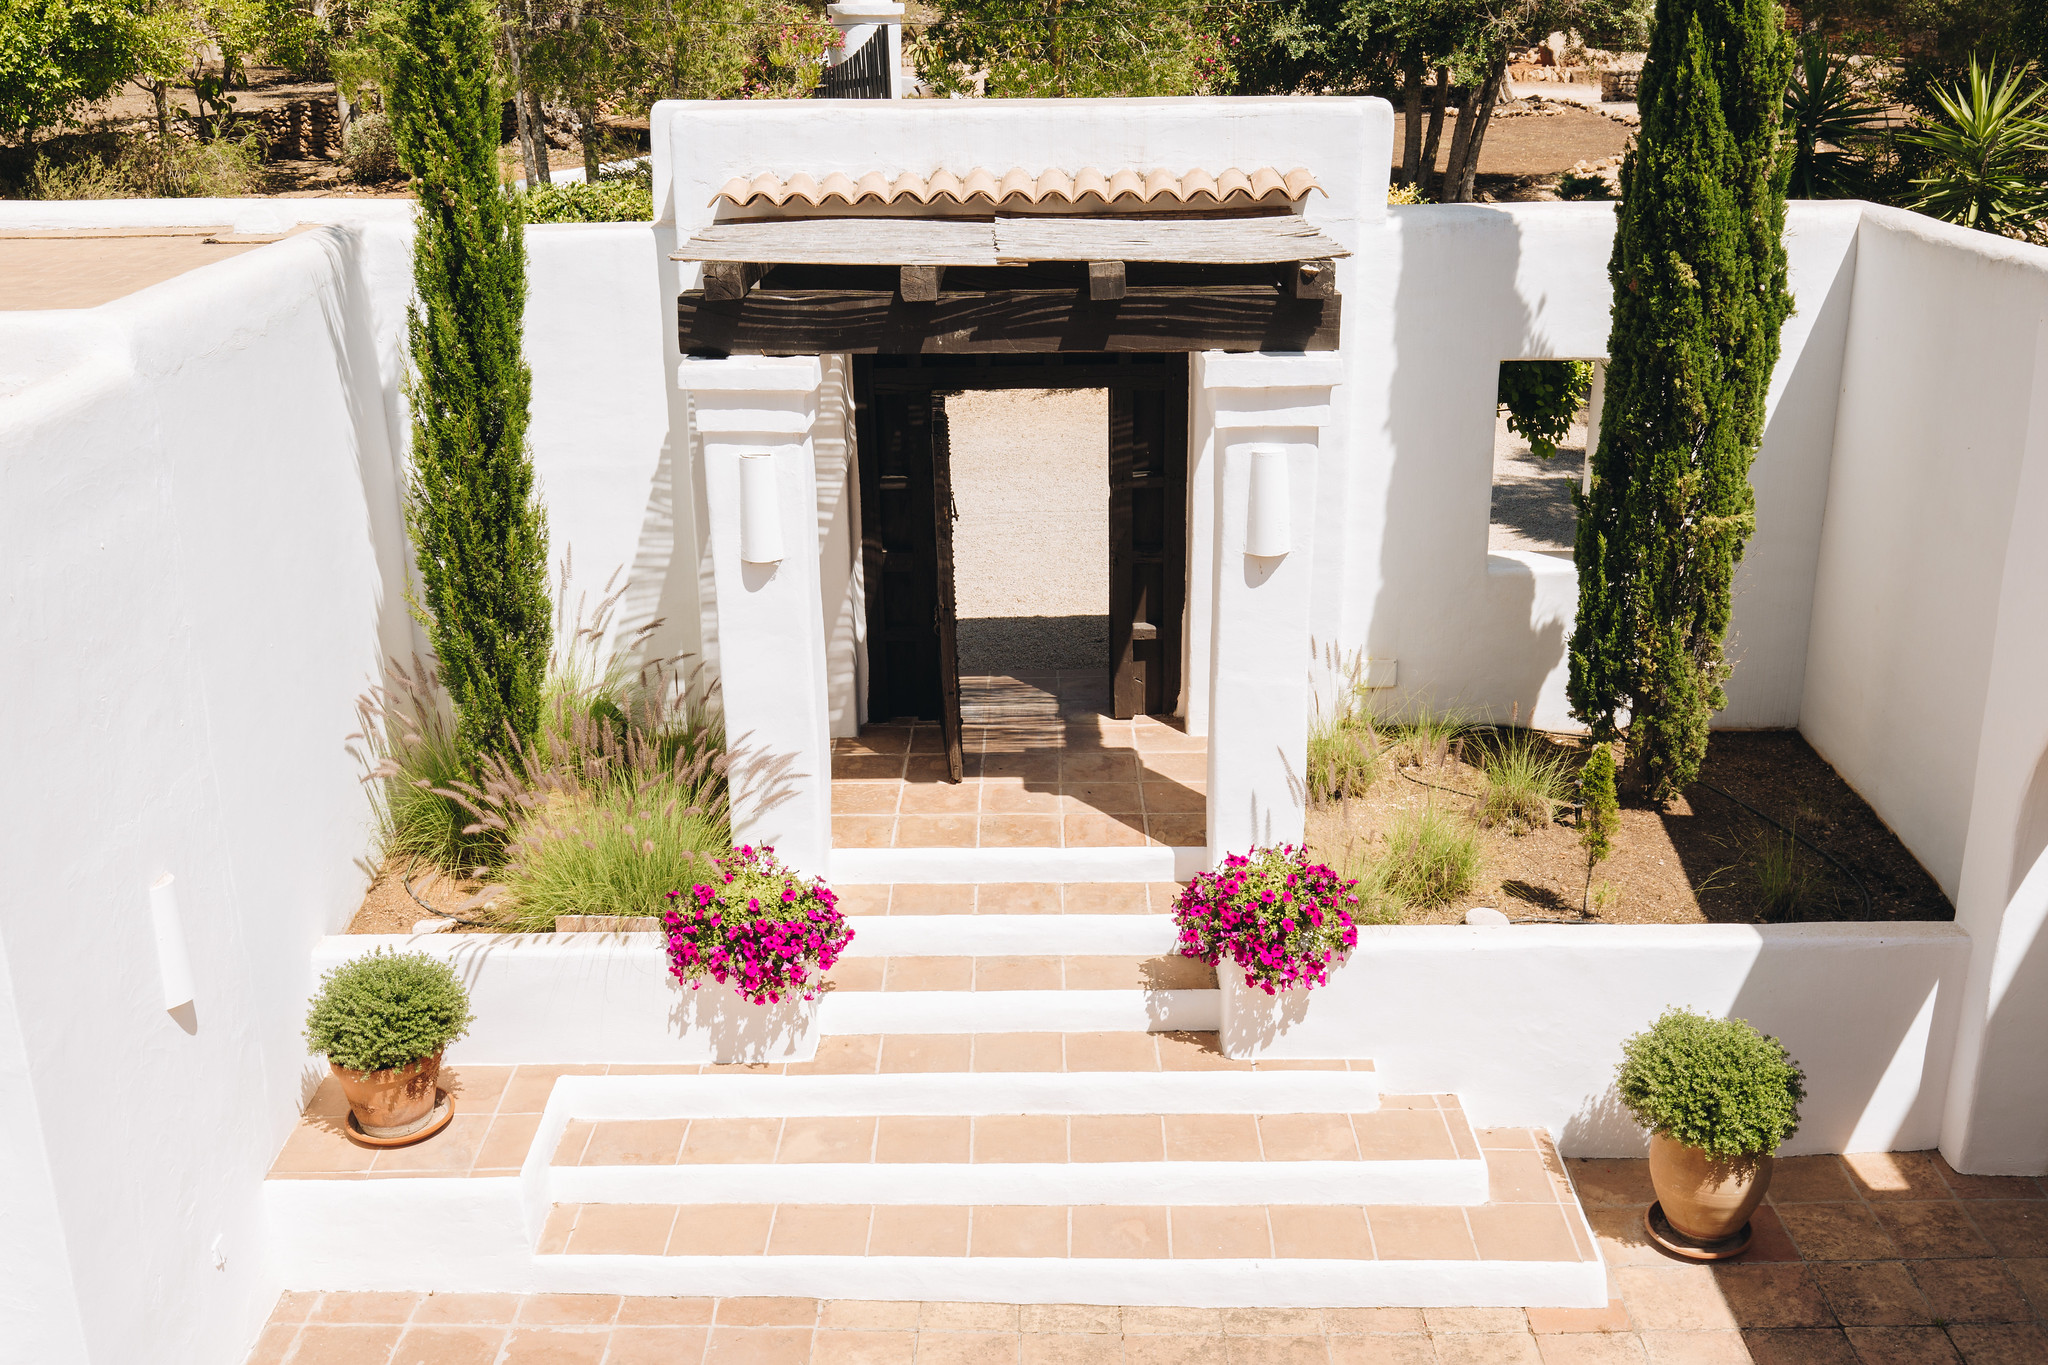 https://www.white-ibiza.com/wp-content/uploads/2020/05/white-ibiza-villas-can-amelida-exterior-steps.jpg